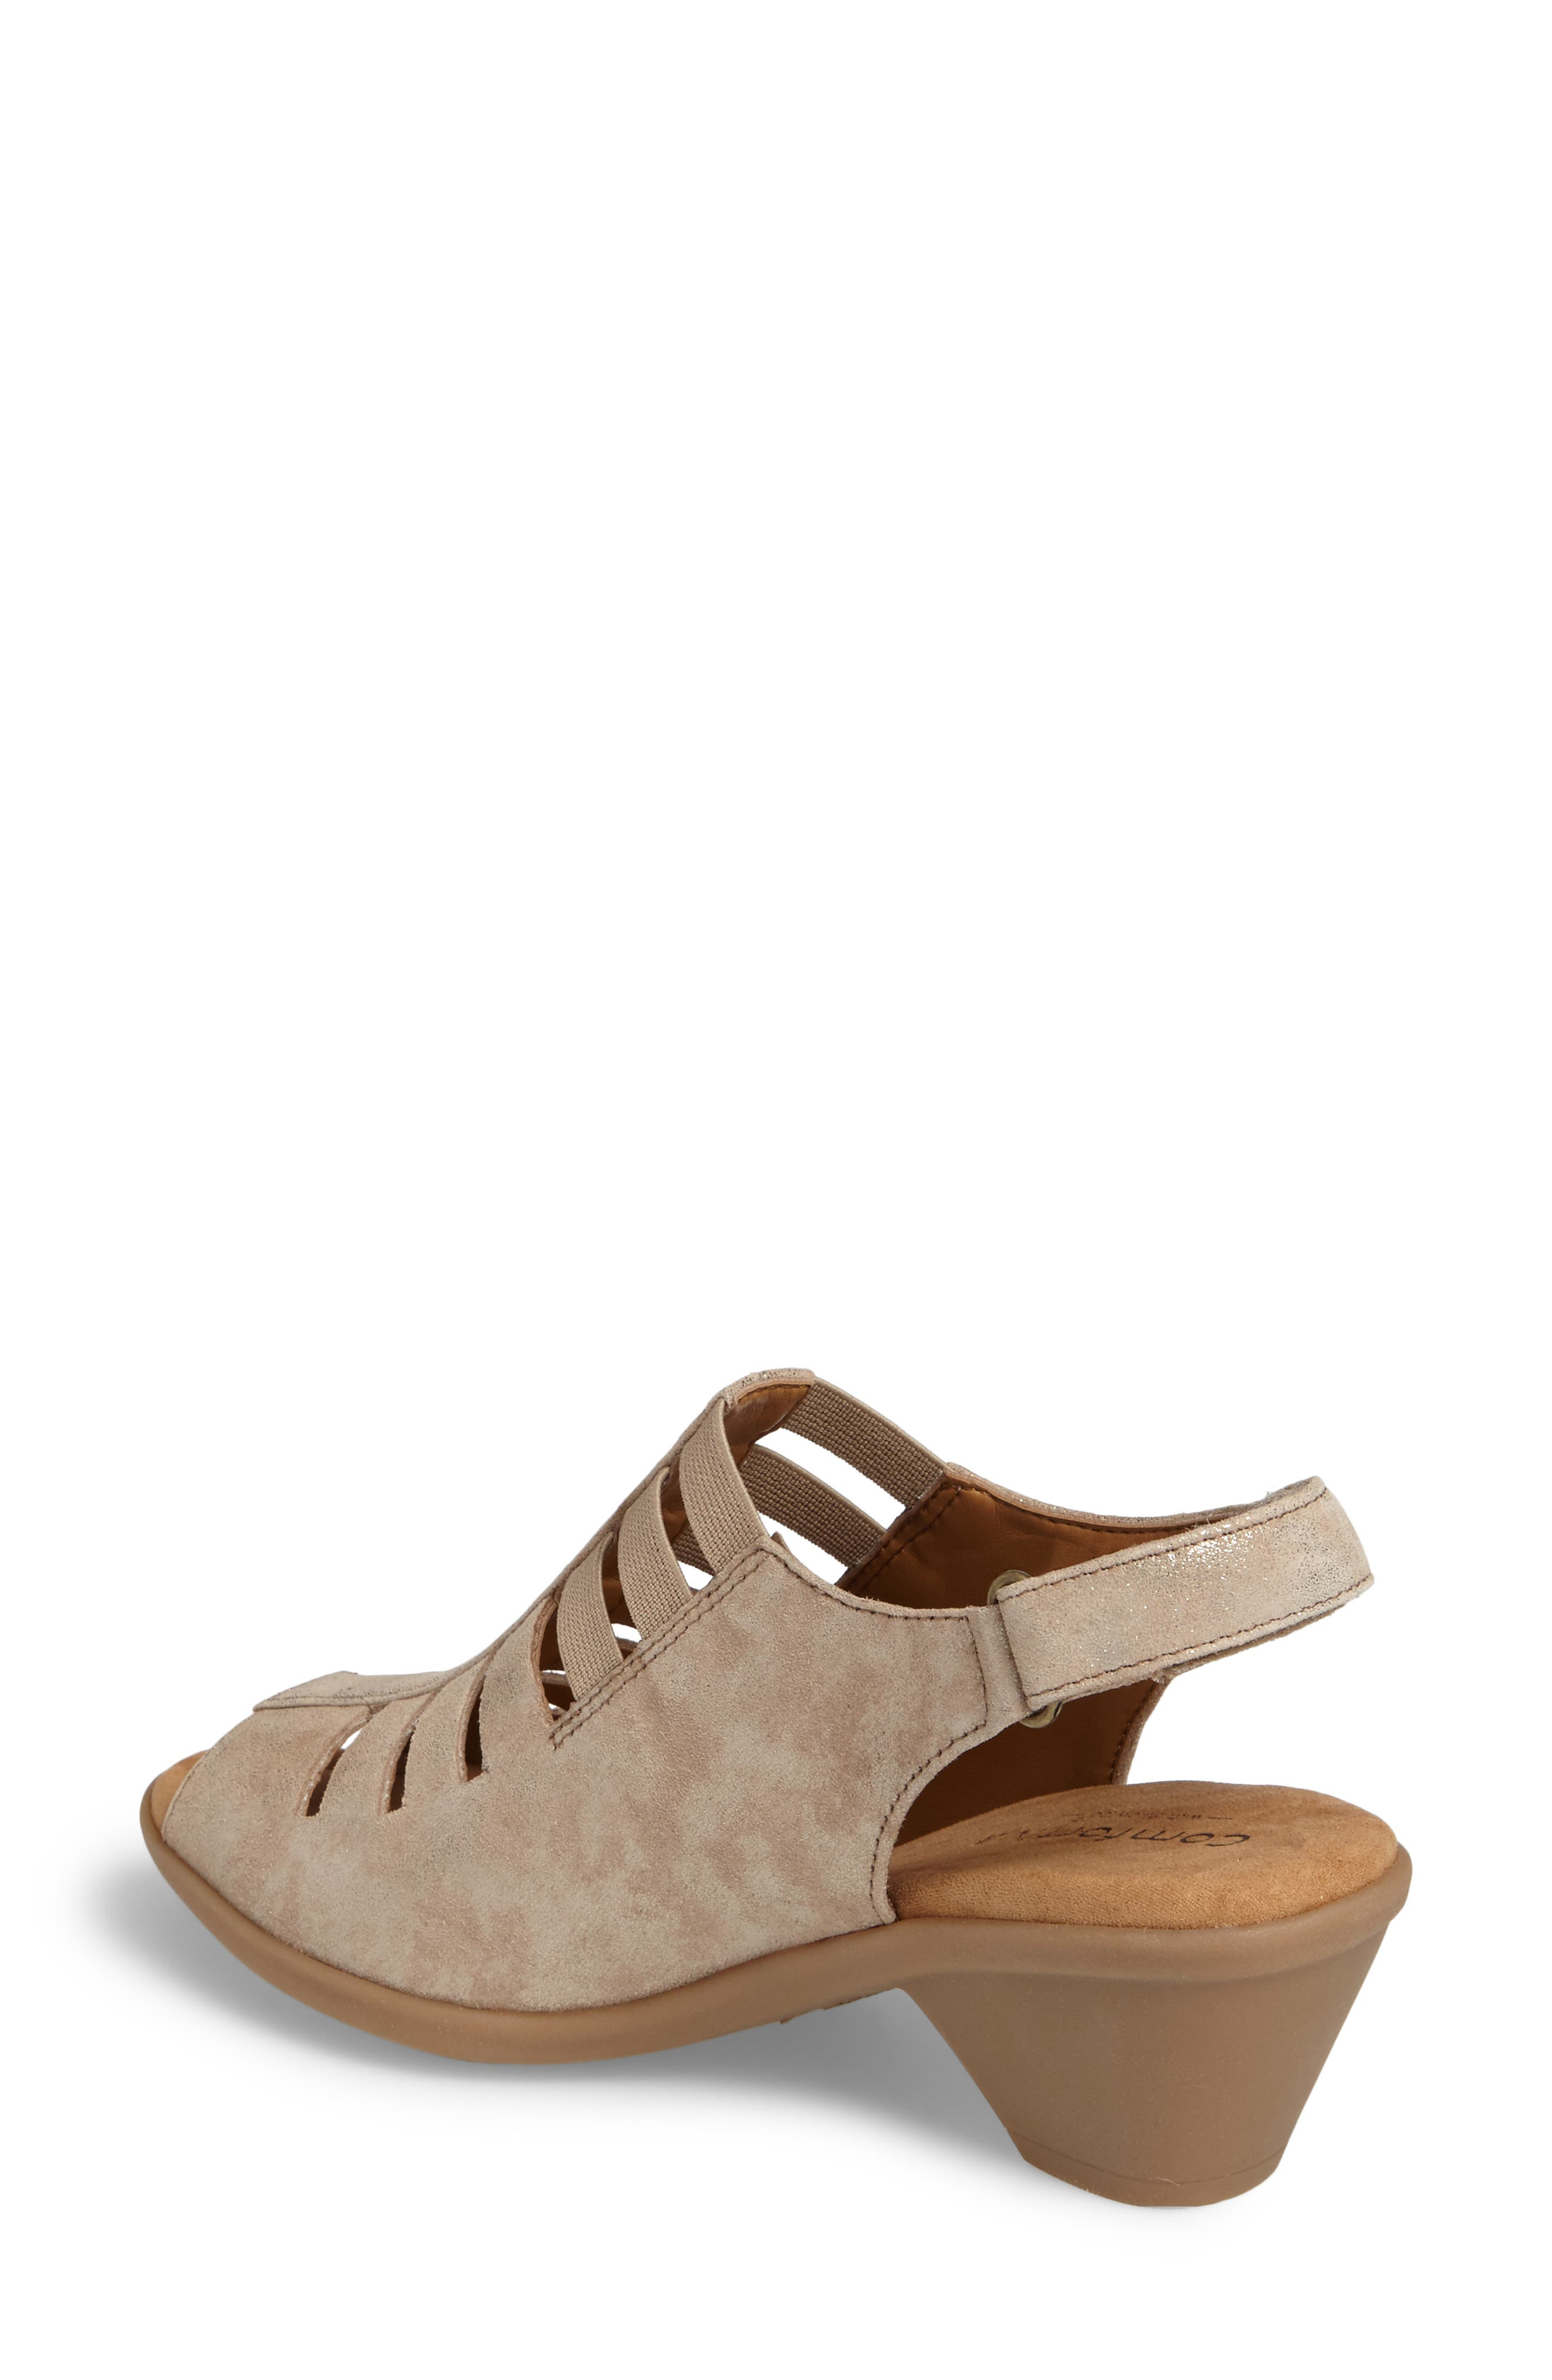 Muk Luks Sue Ellen Sandal Tan Stripe C65n8559